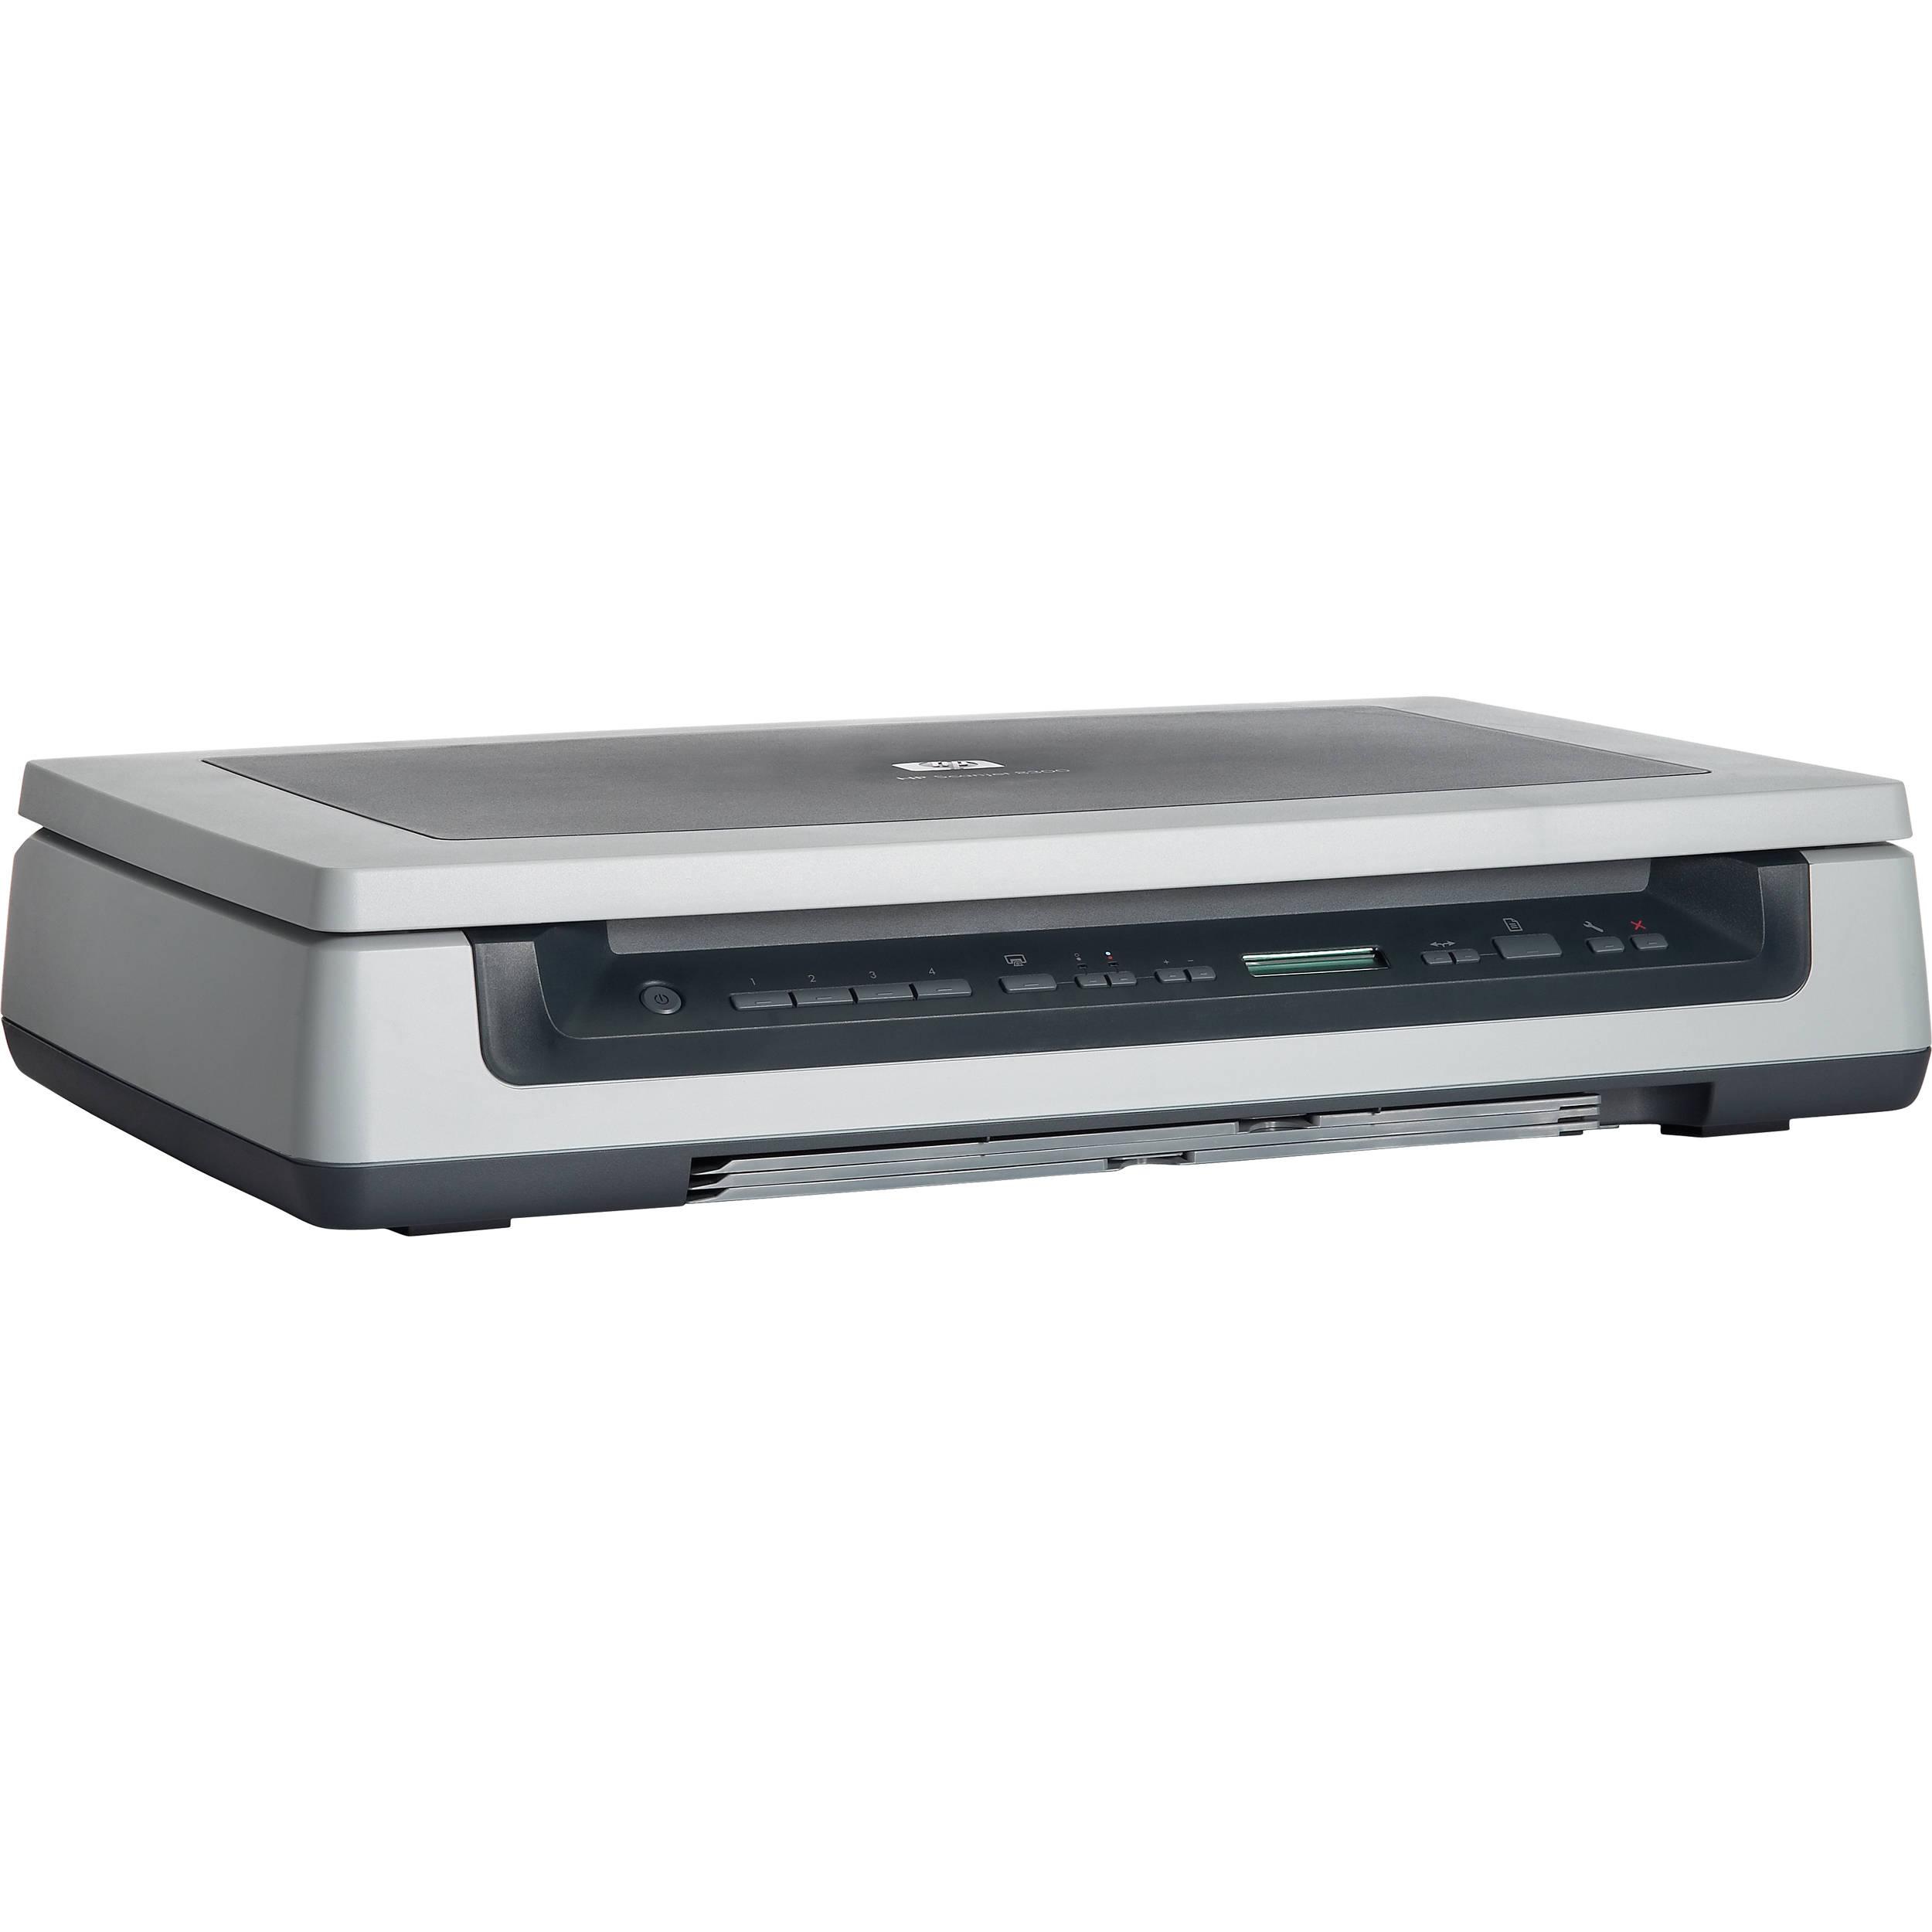 HP SCANNER 8300 WINDOWS 7 64BIT DRIVER DOWNLOAD